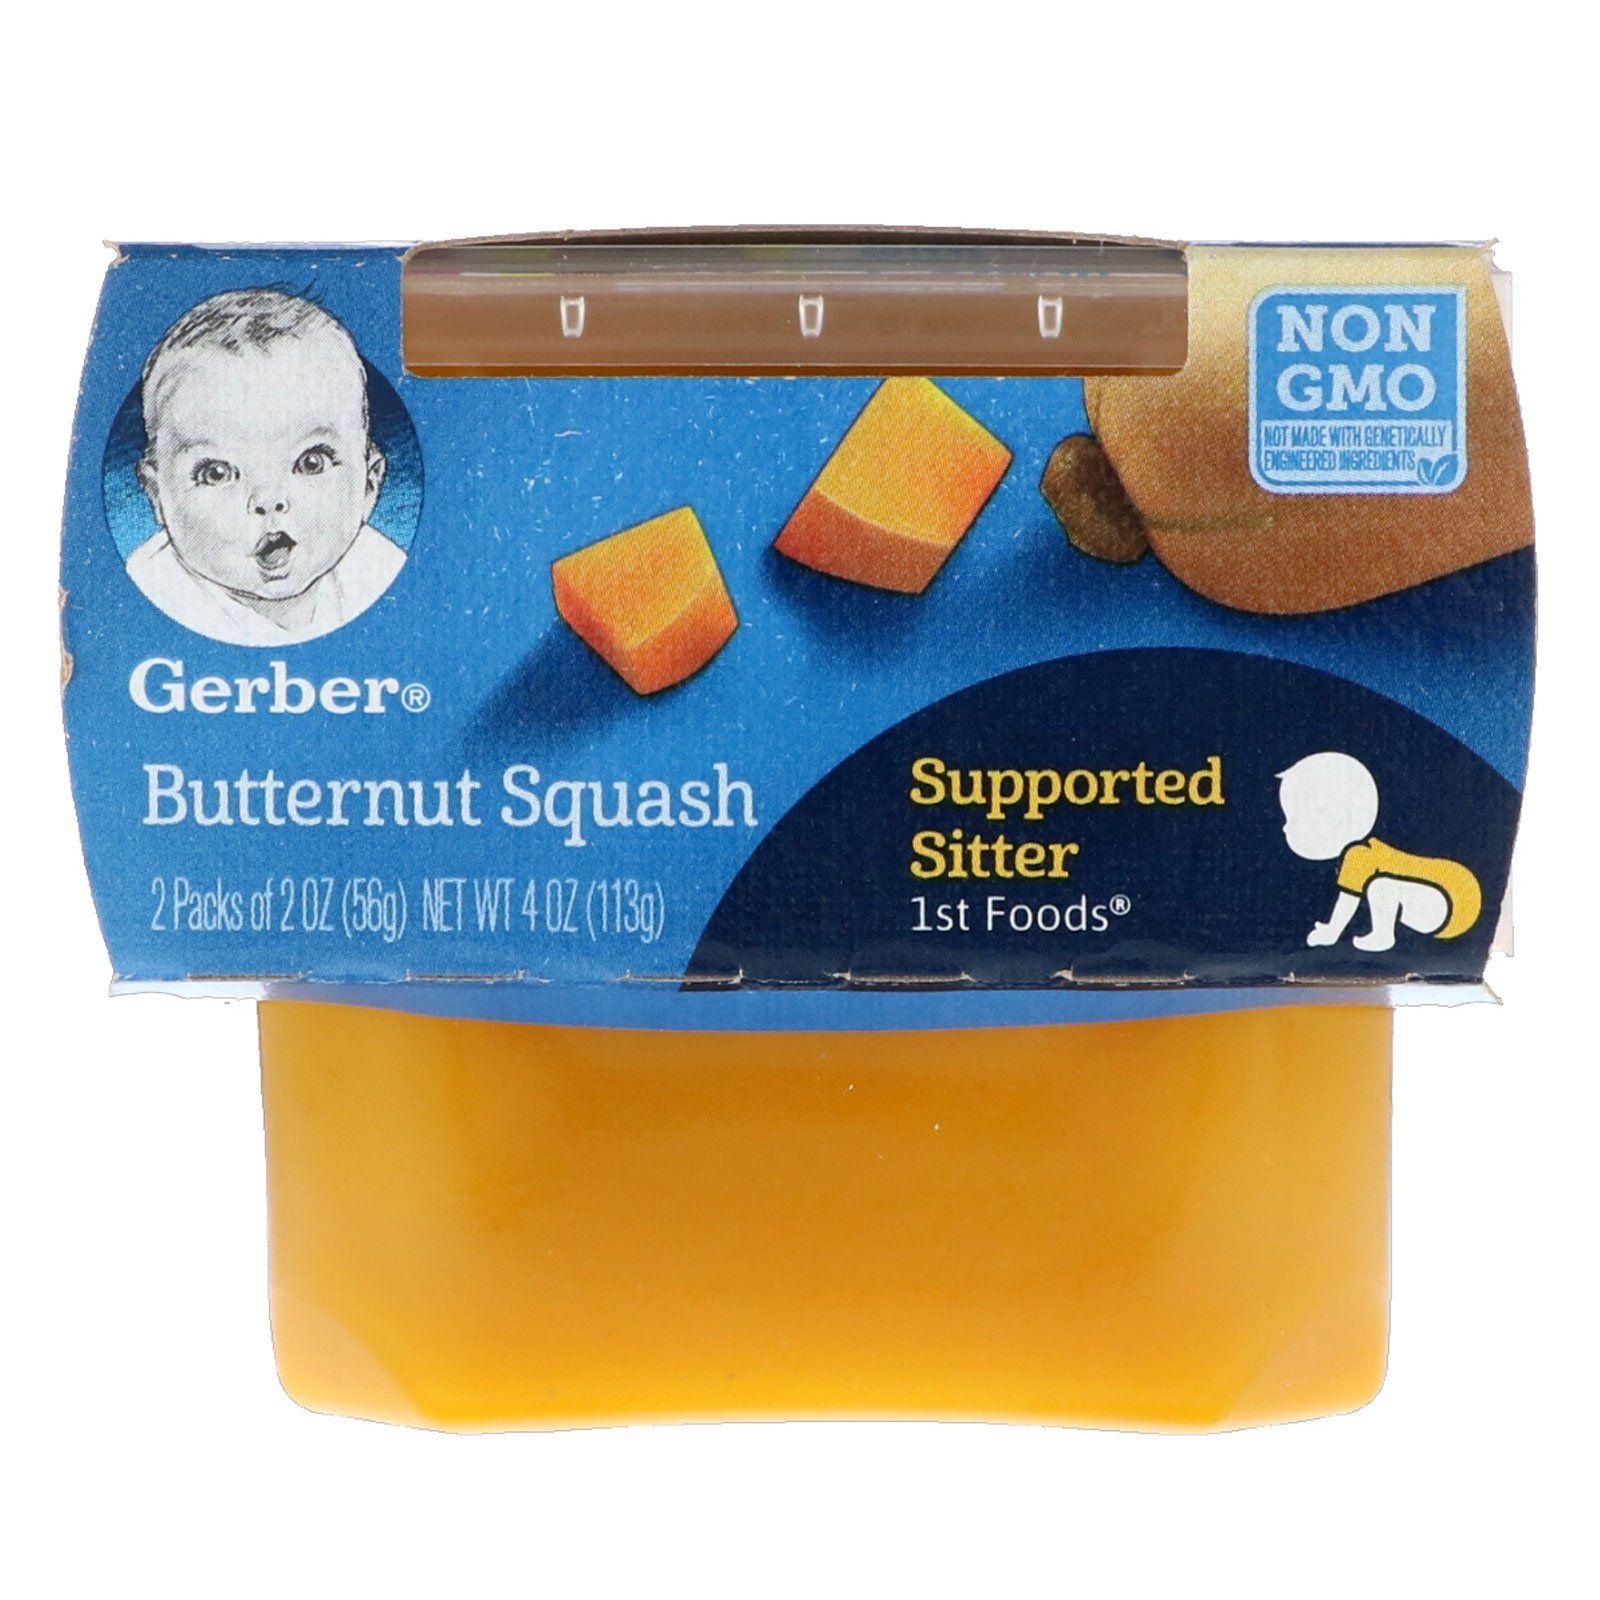 Gerber 1st foods butternut squash 2 pack 2 oz 56 g